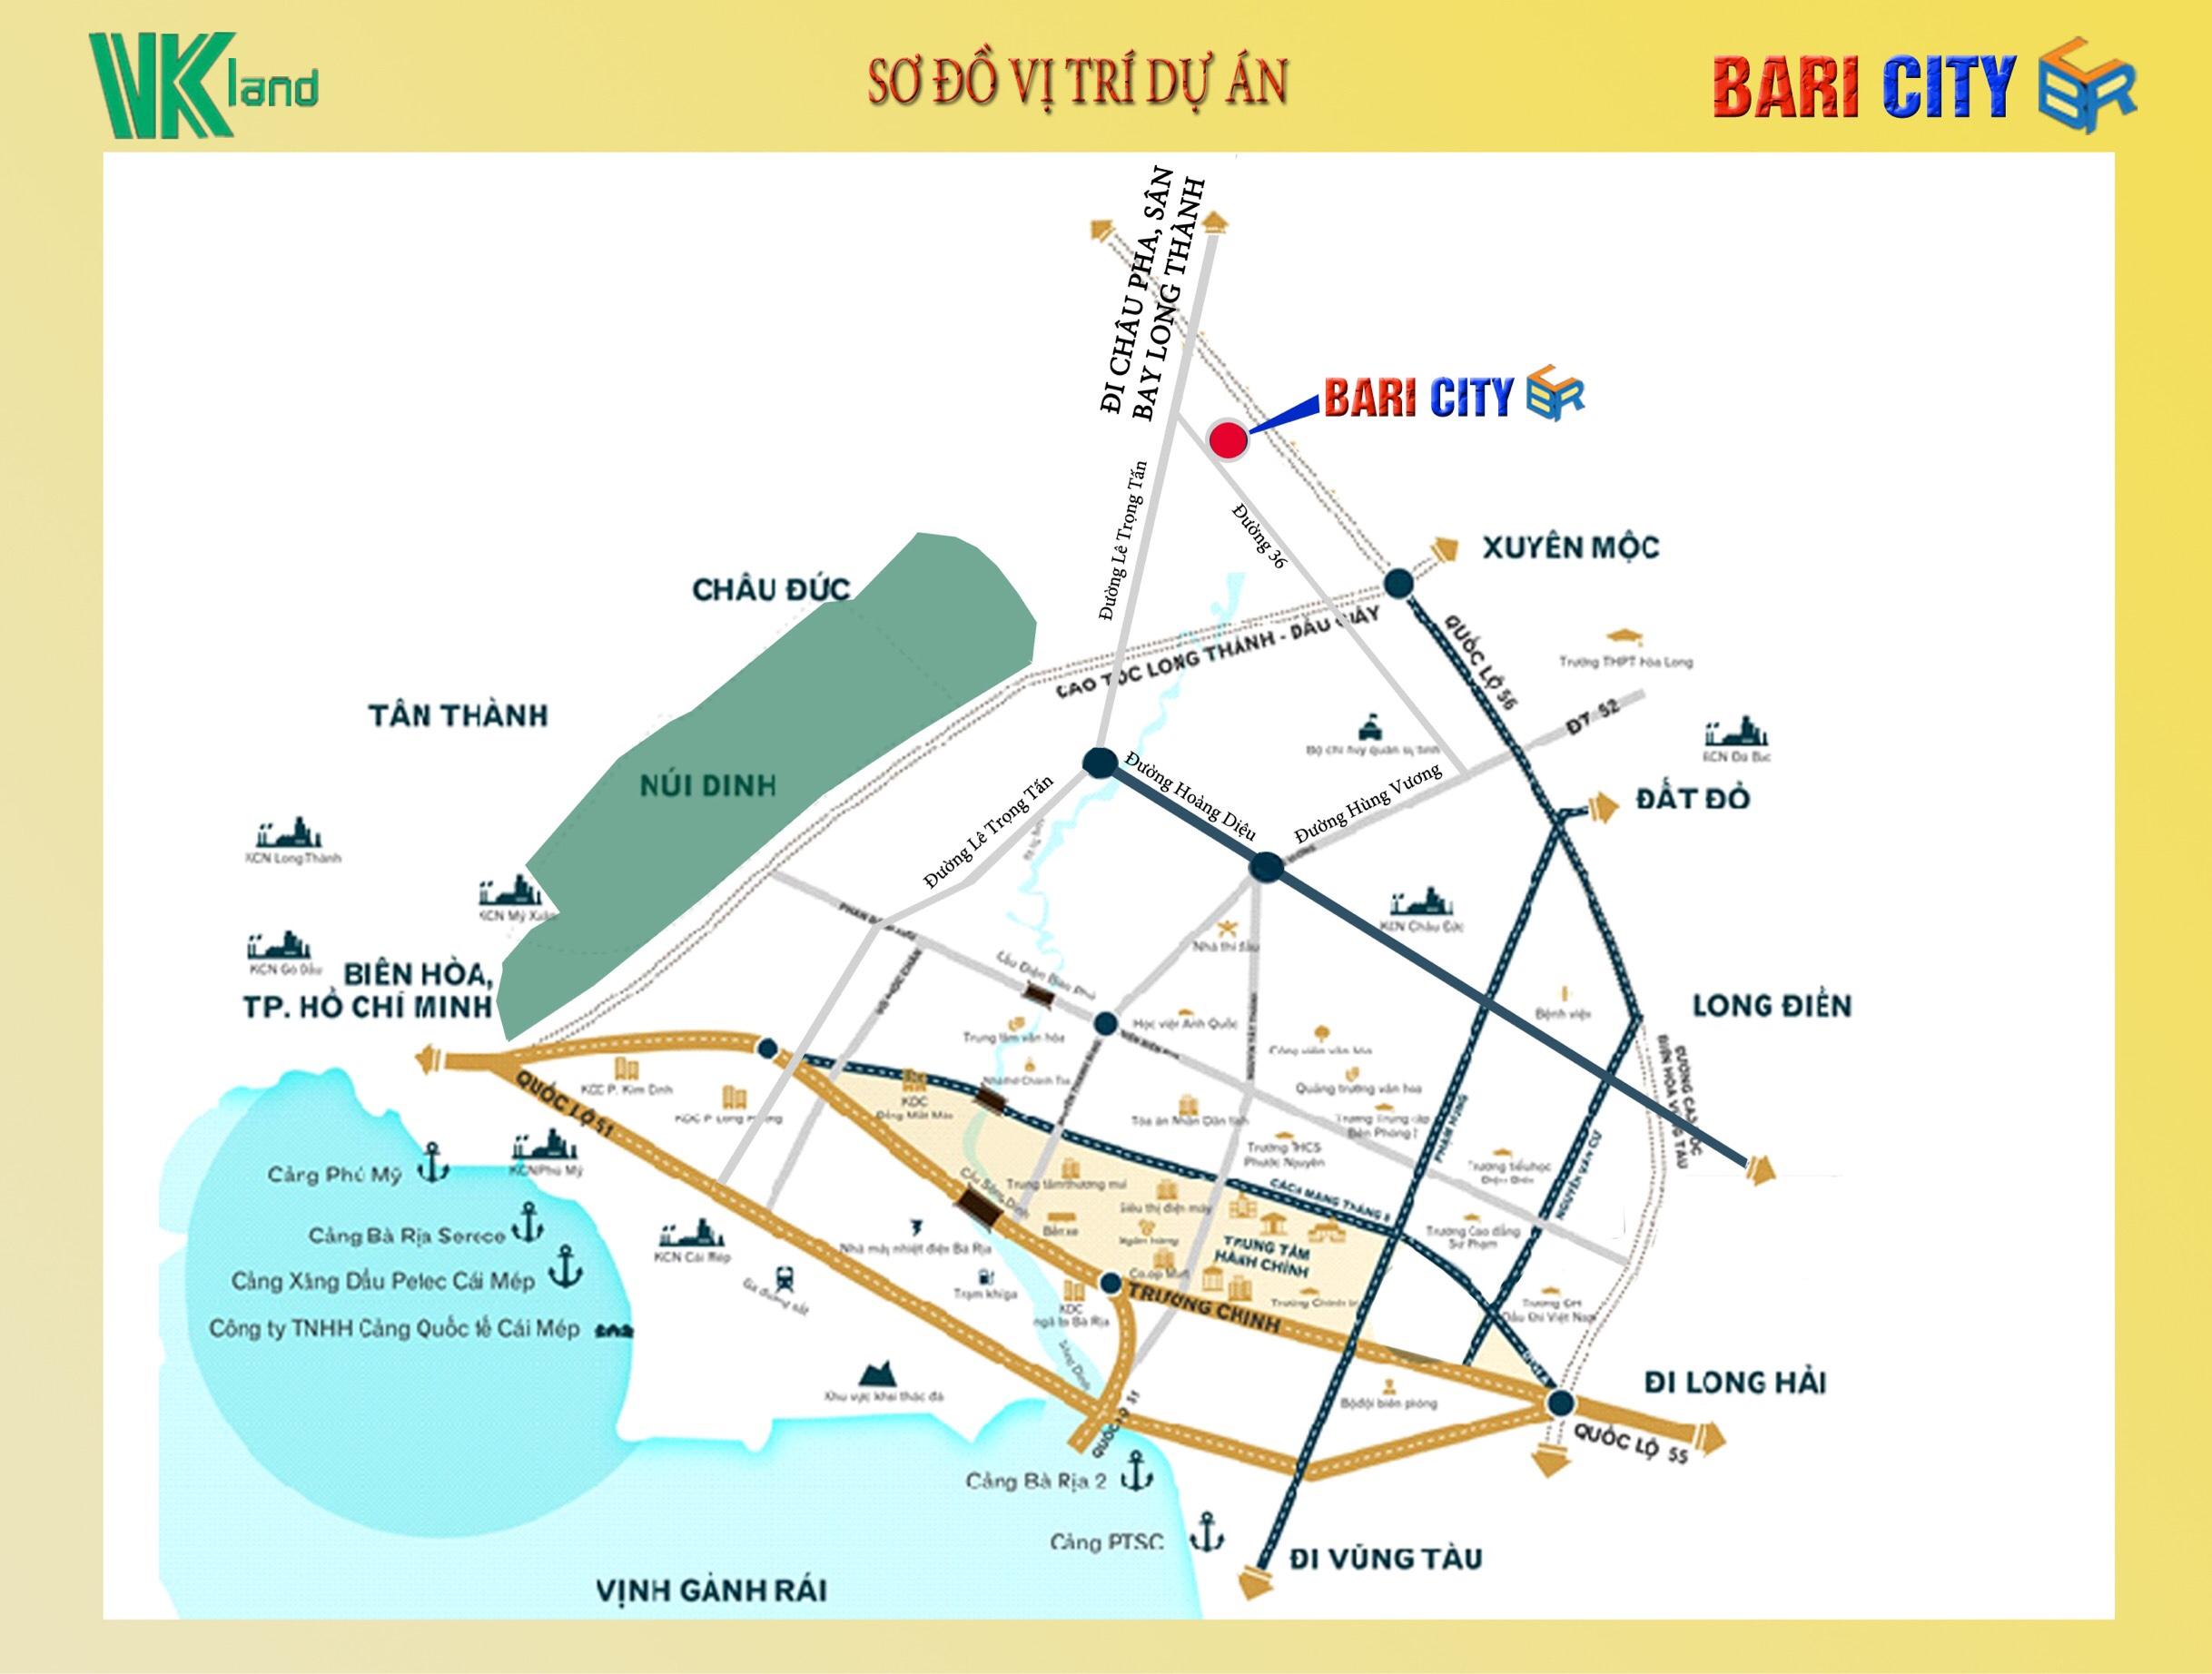 Bari City